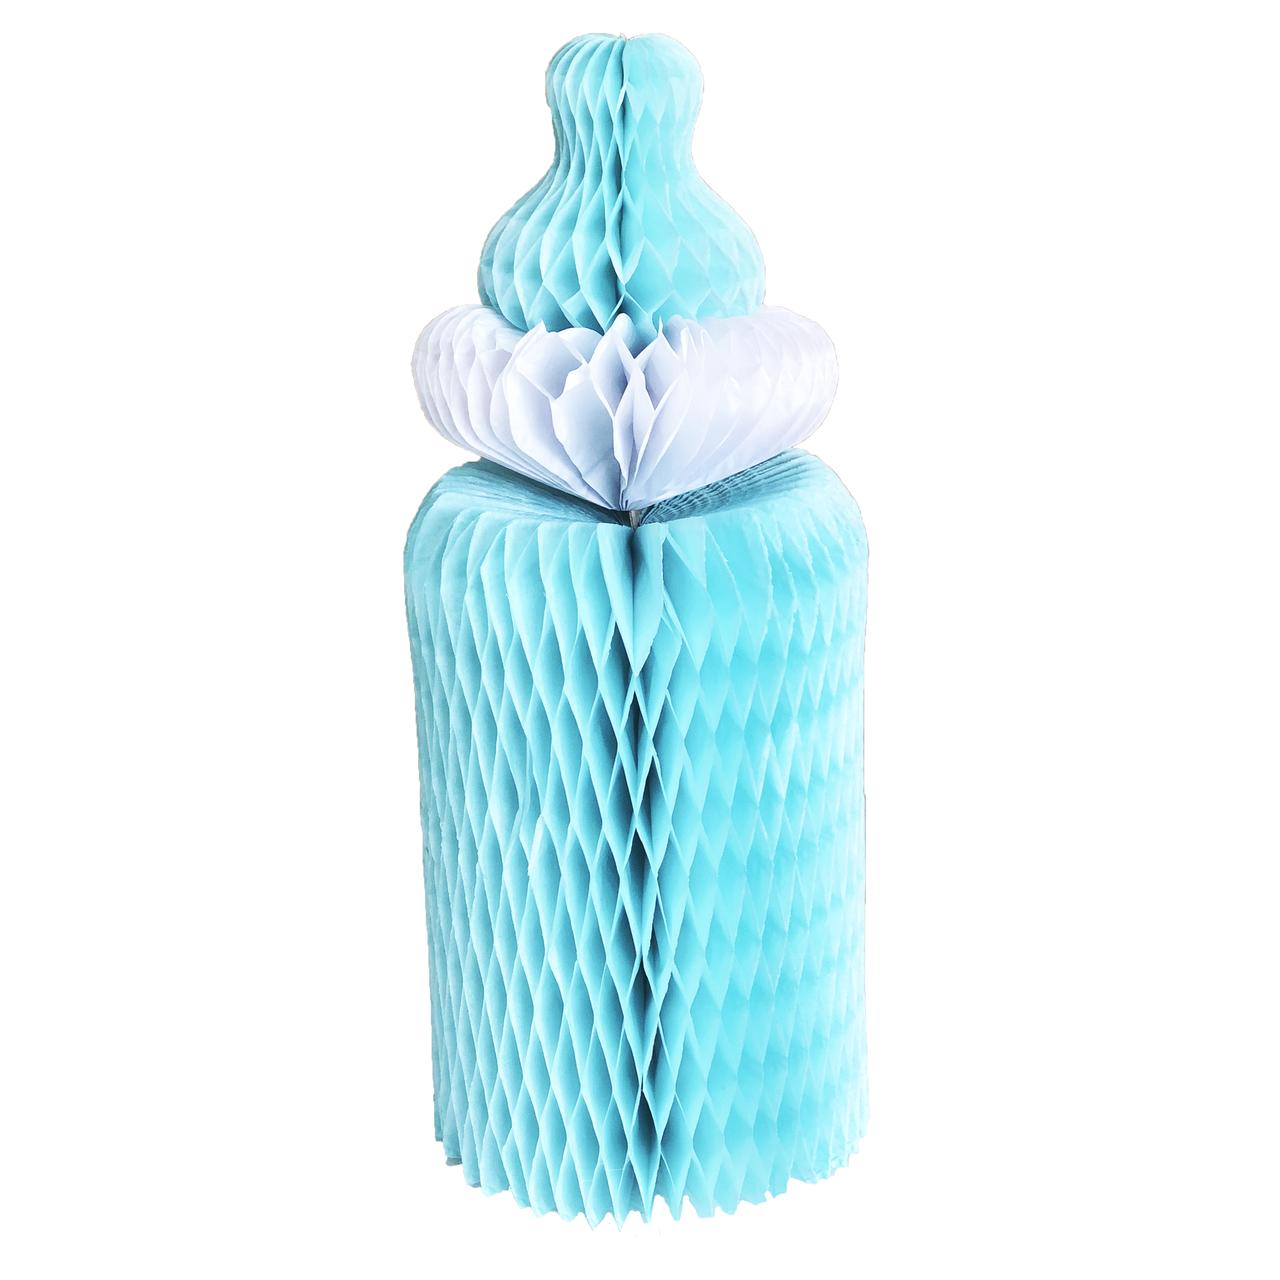 Паперові стільники з тишею Дитяча пляшечка, блакитна